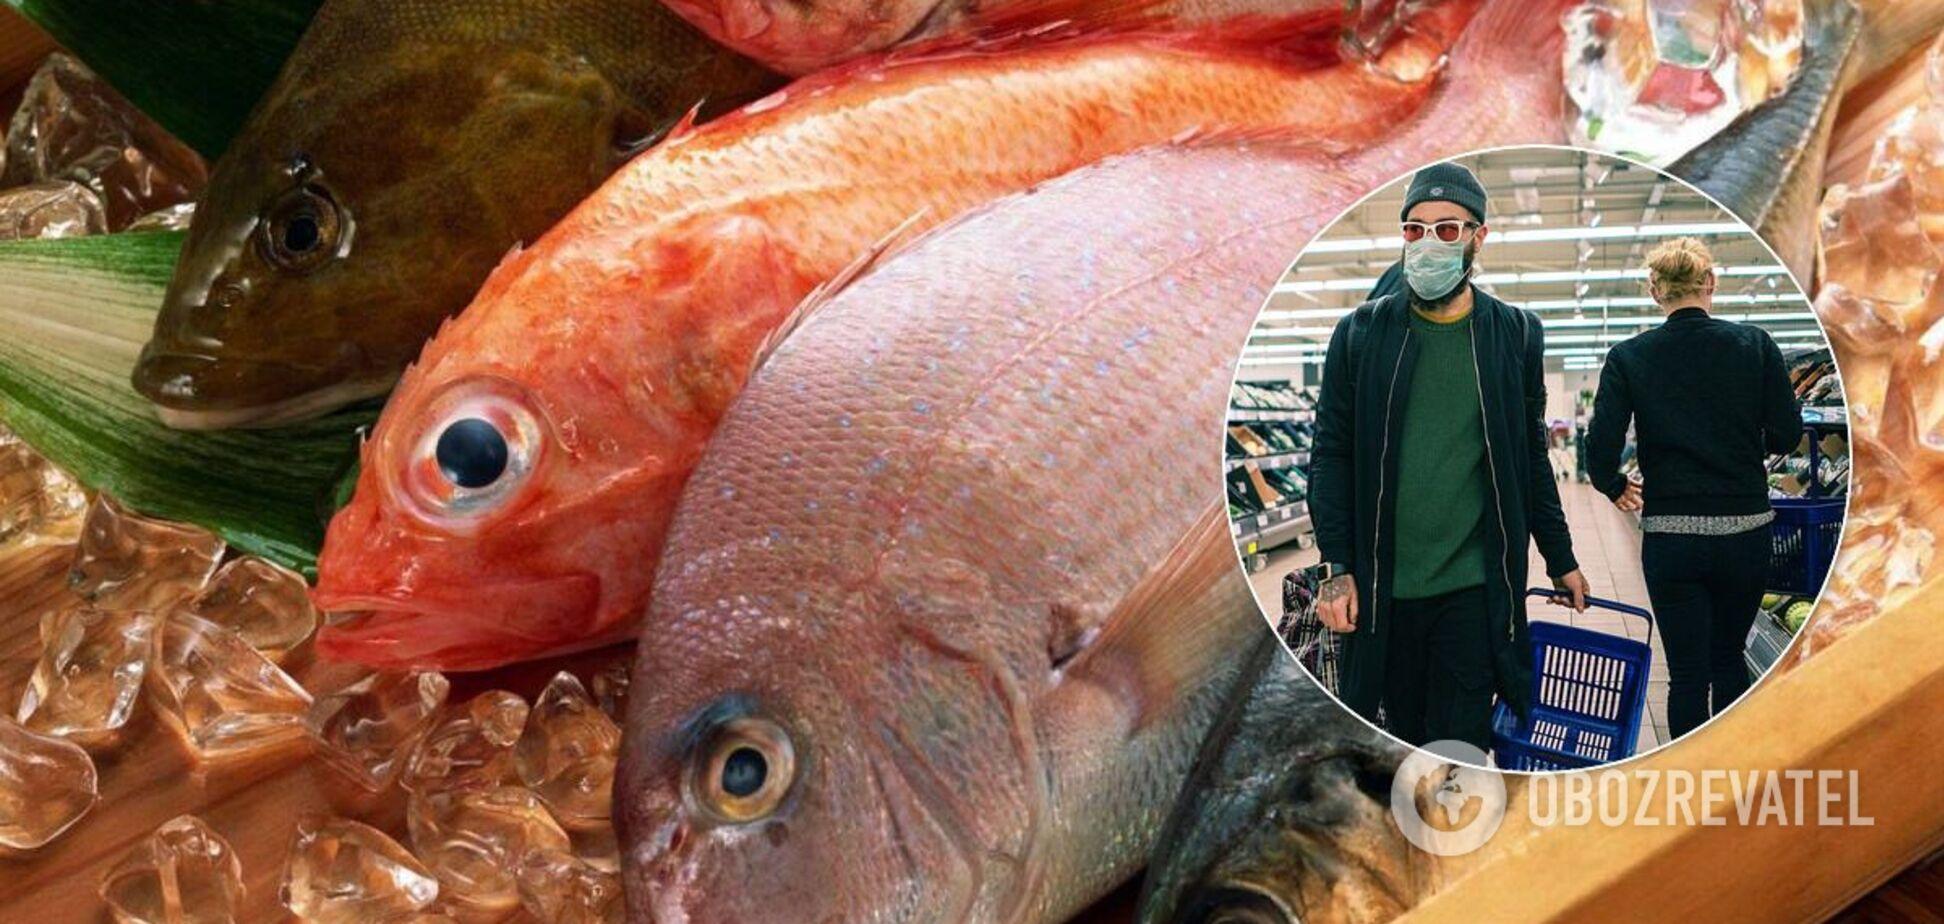 Прострочену рибу продають в кожному українському магазині – Союз споживачів